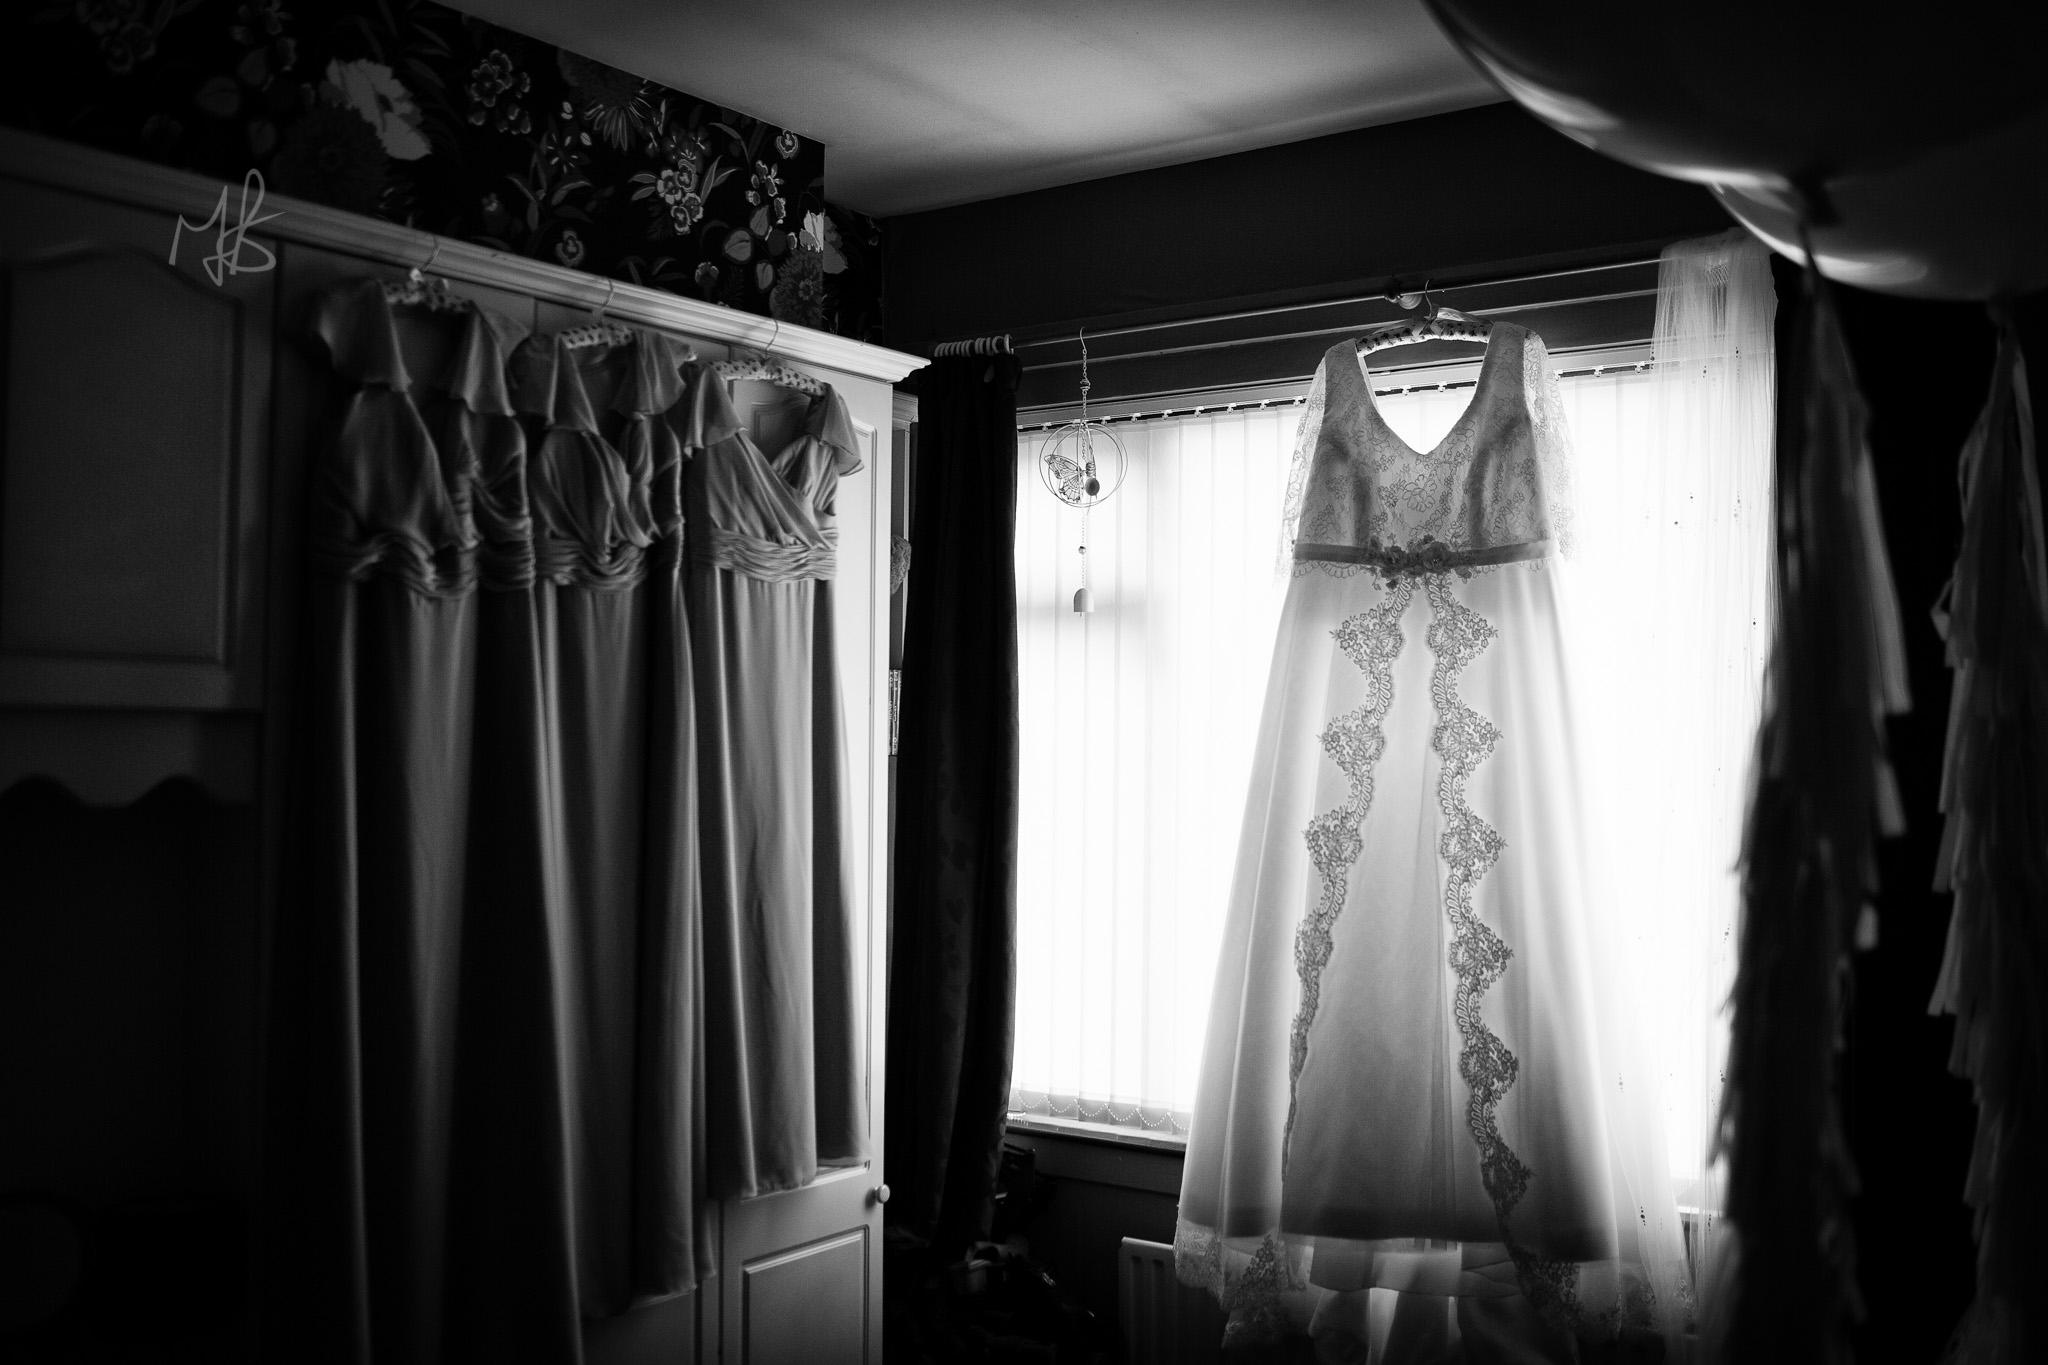 Northern-Ireland-Wedding-Photographer-Mark-Barnes-Ballymena_wedding-photography-Leighinmohr-House-Seamas_Alanna_For-web-3.jpg